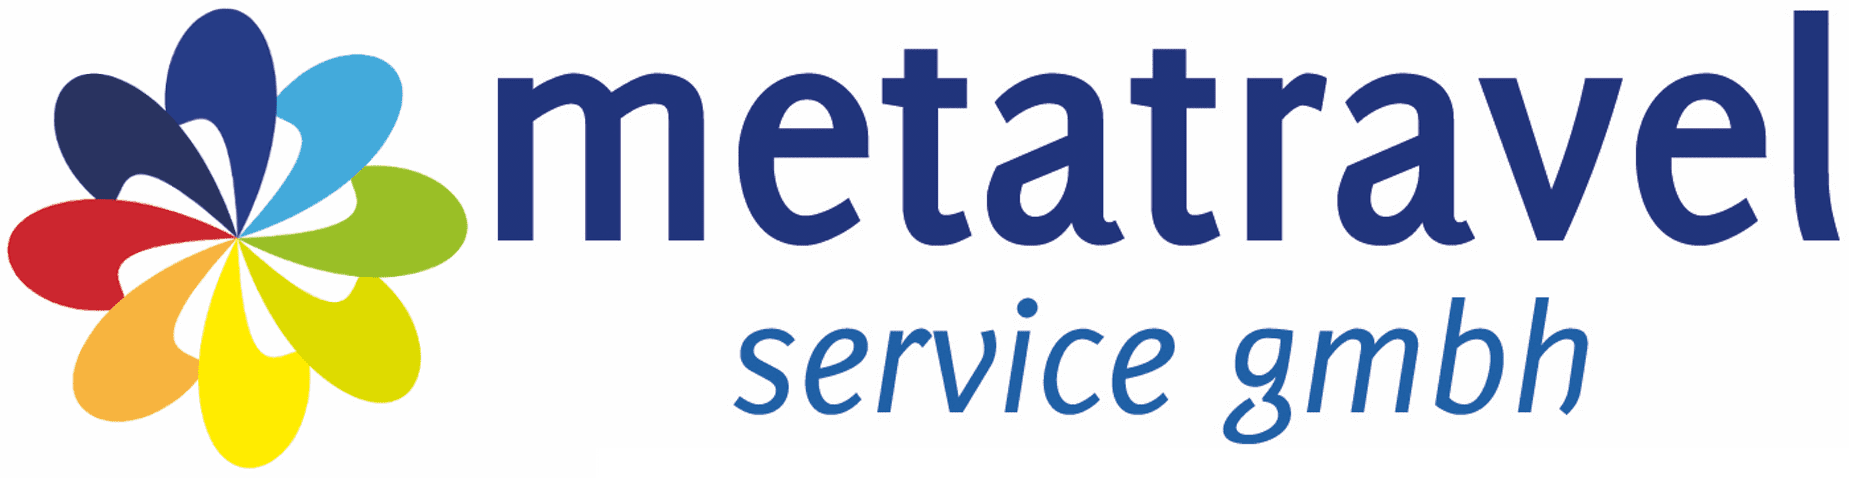 Metatravel